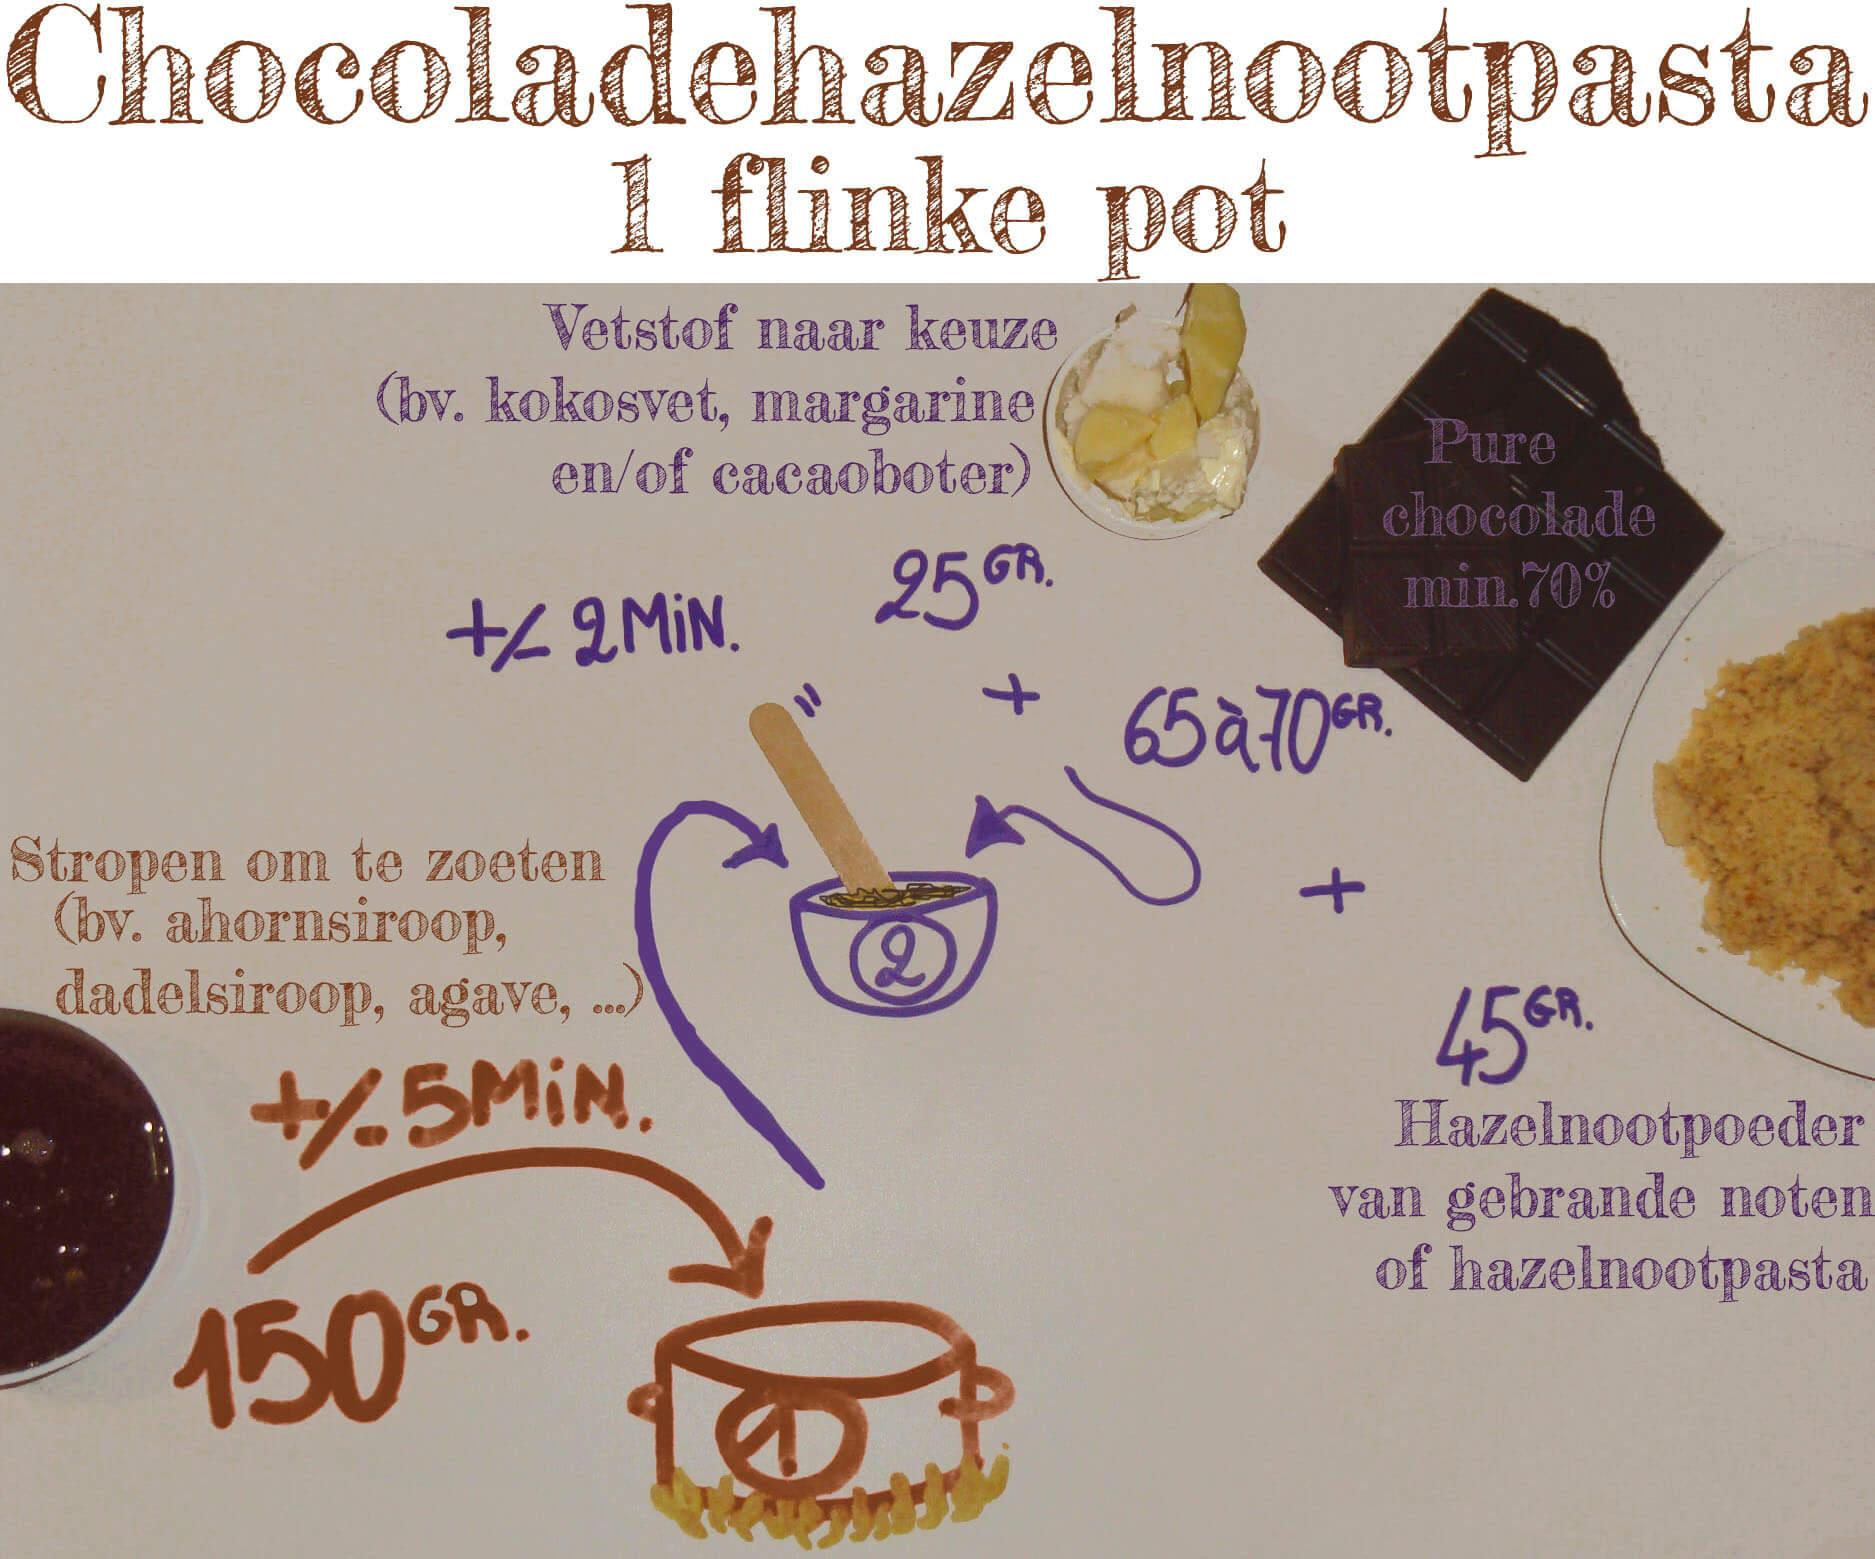 Chocoladehazelnootpasta stappenplan.jpg